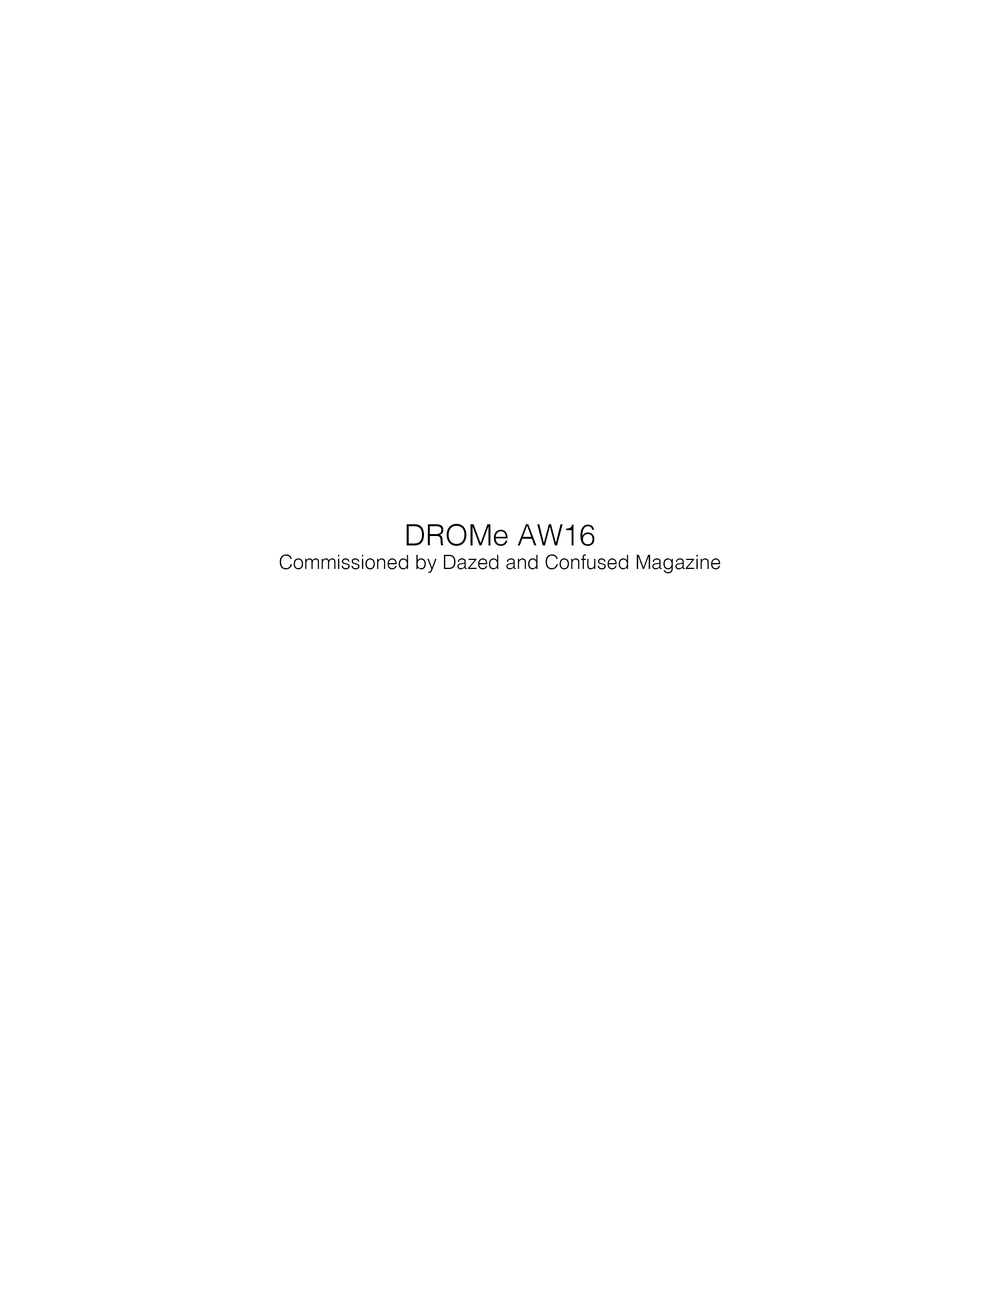 DROMe AW16.jpg